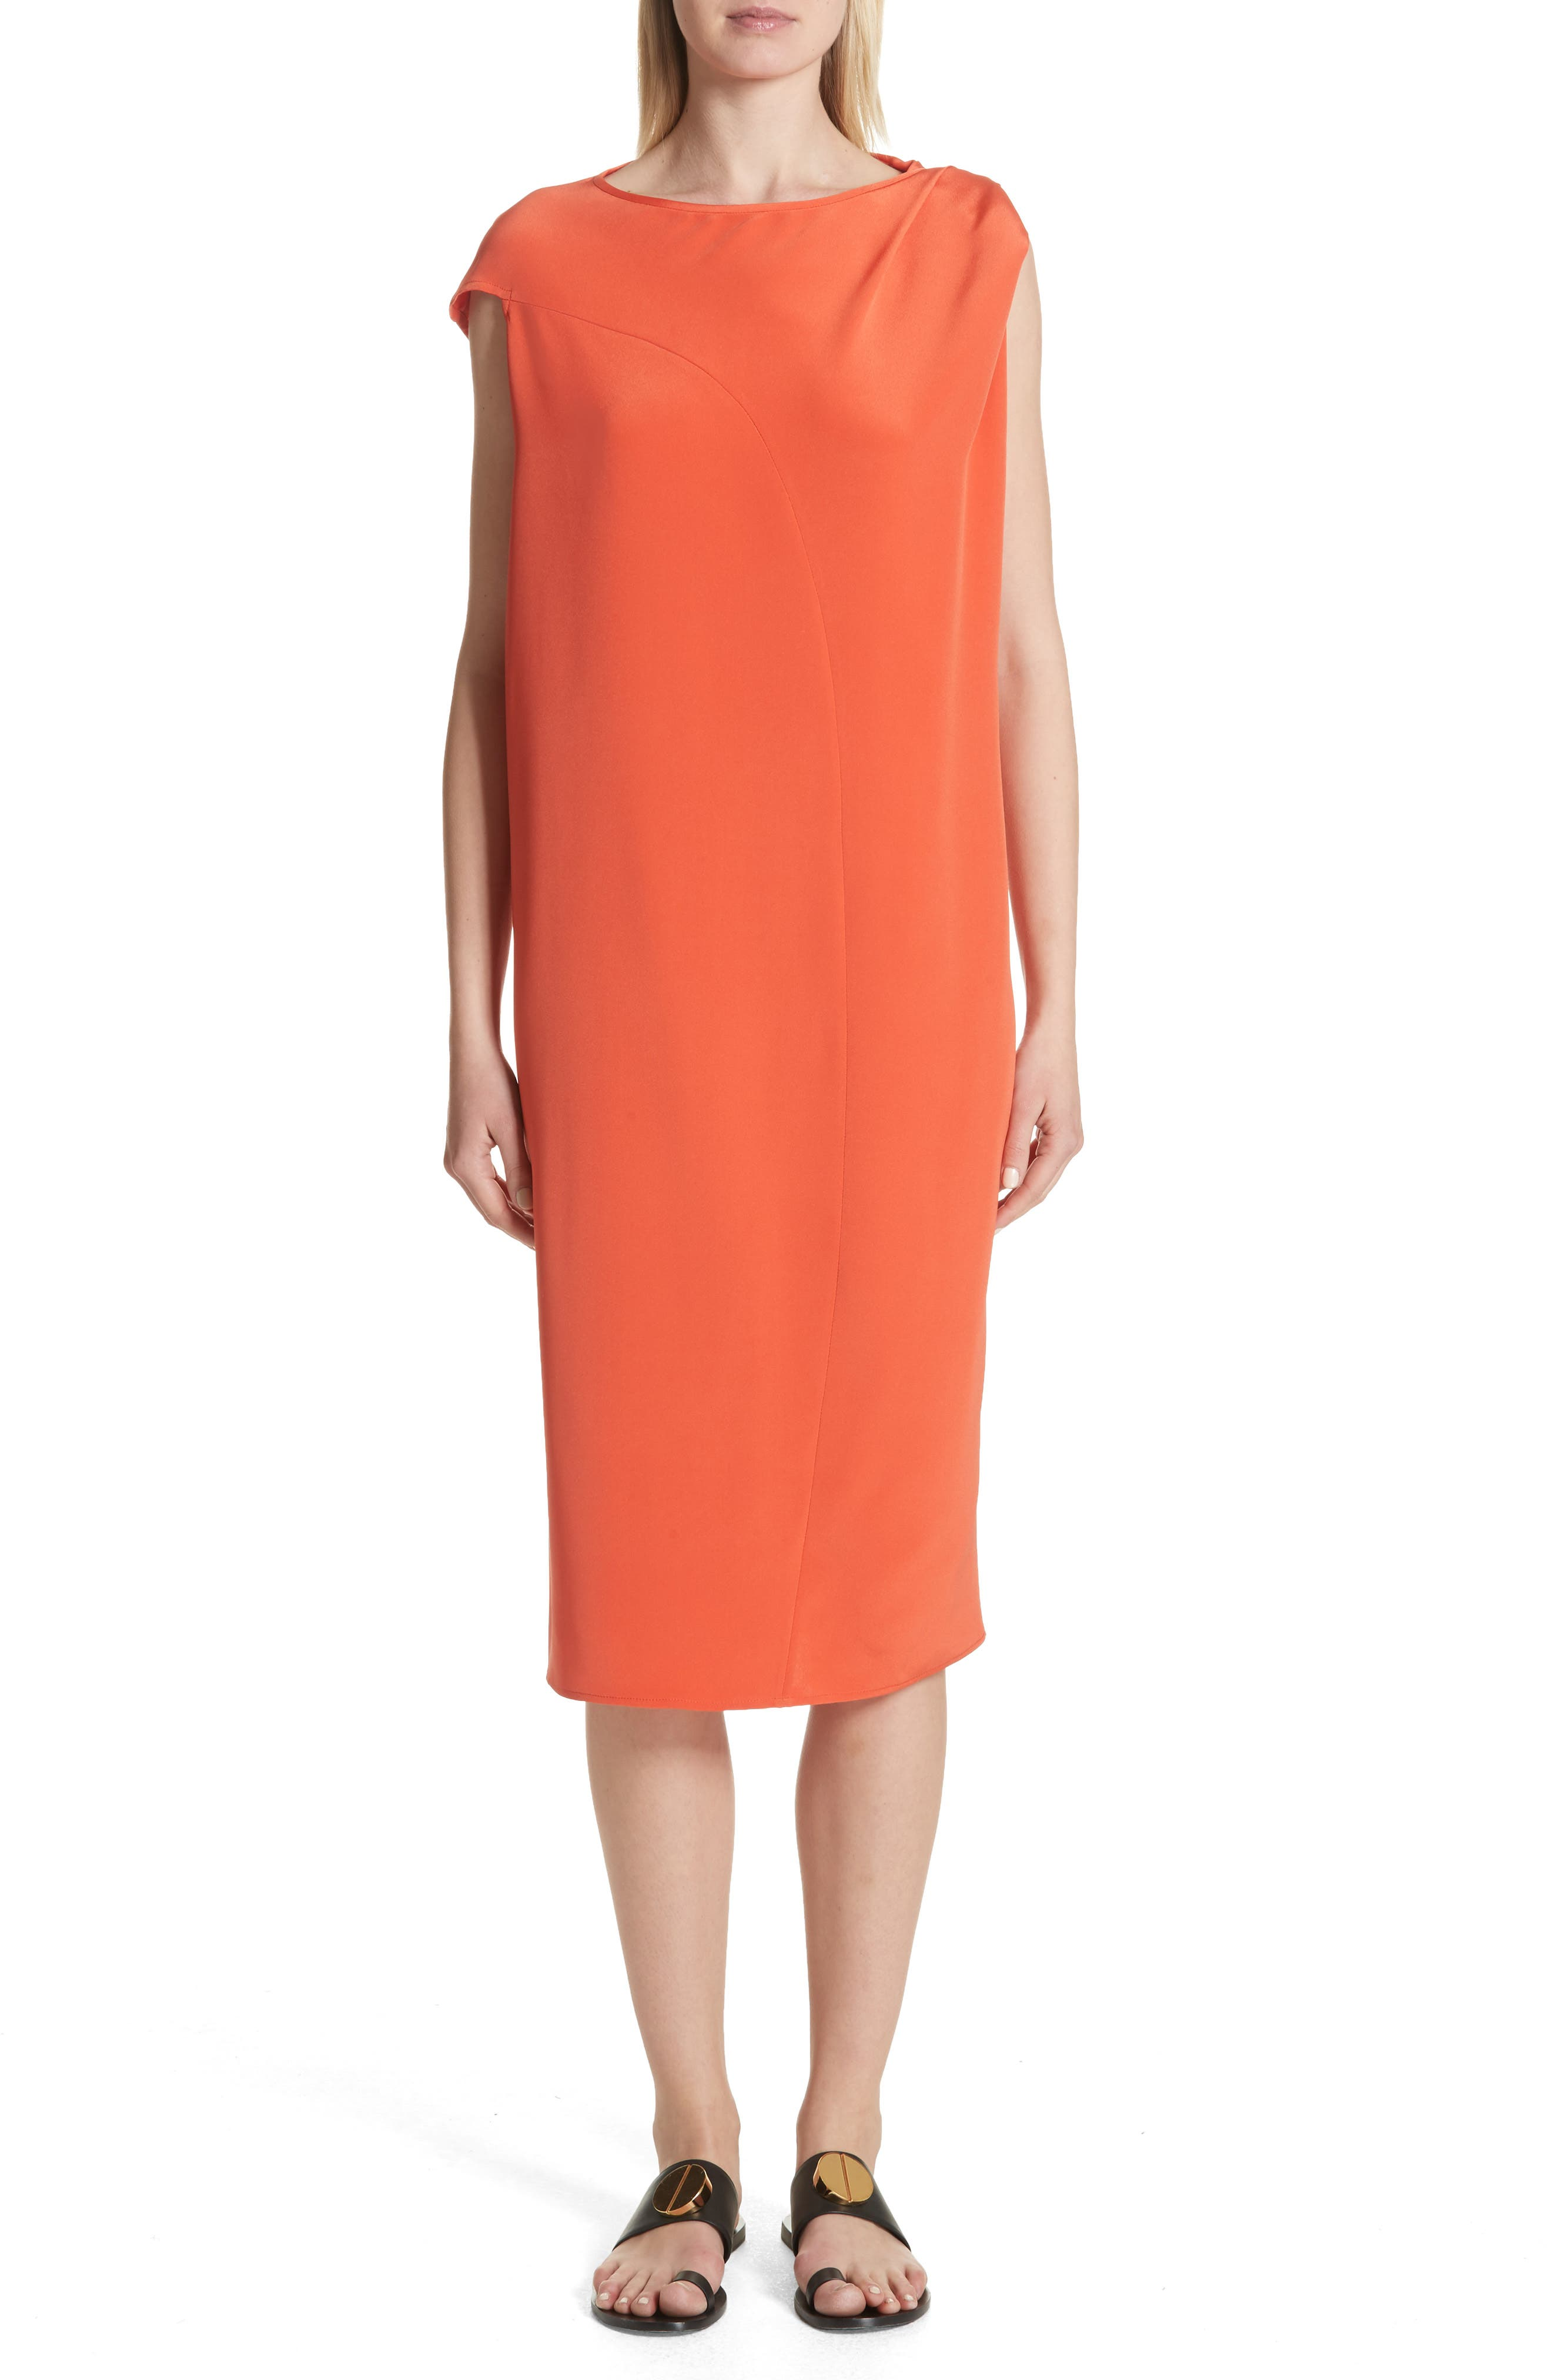 ZERO + MARIA CORNEJO,                             Twist Detail Silk Dress,                             Main thumbnail 1, color,                             840